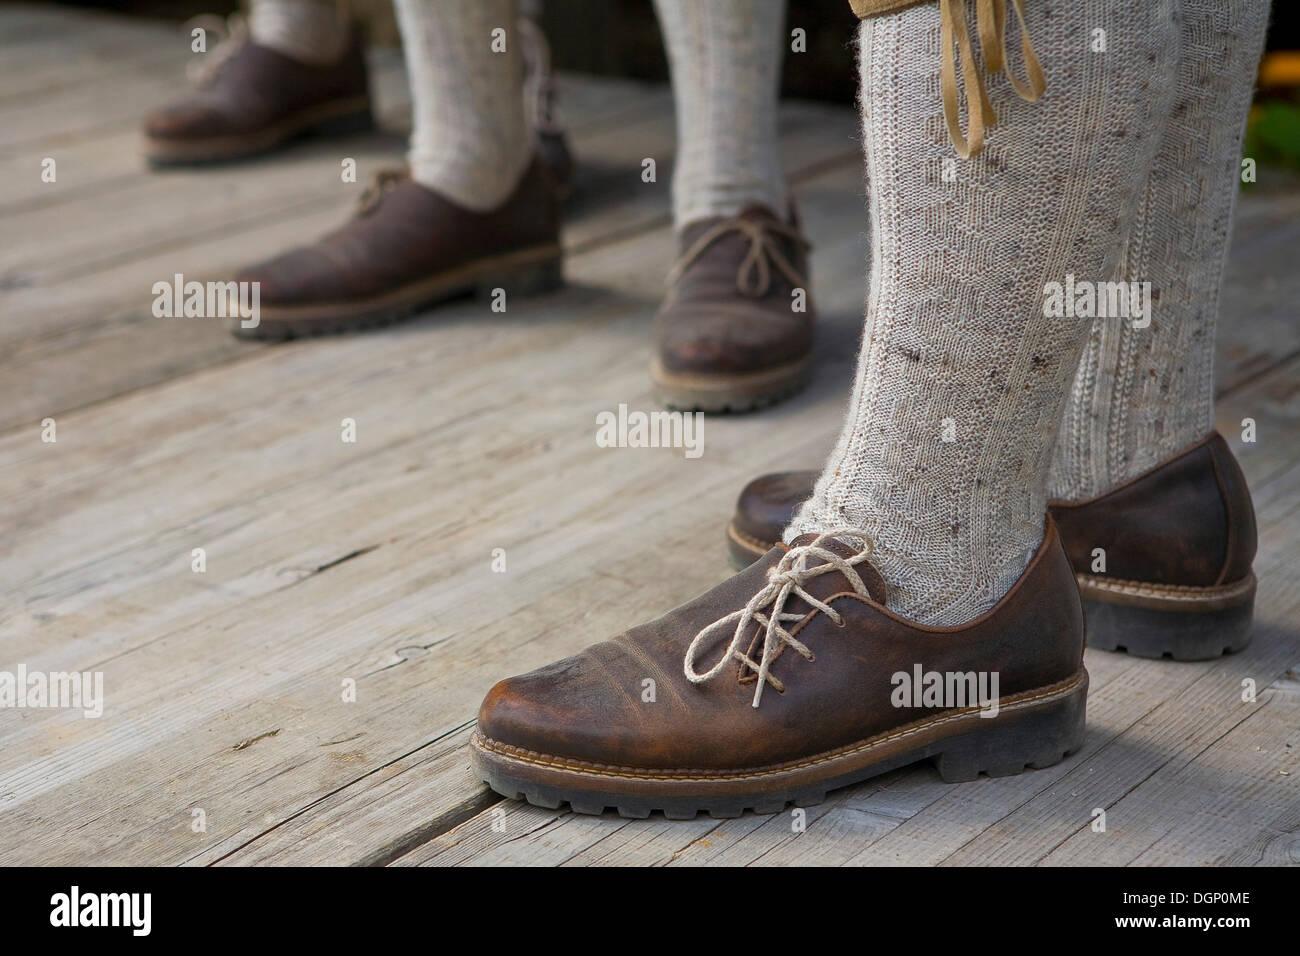 Tiroler Tracht, Detail der Füße, Südtirol, Italien, Europa Stockfoto